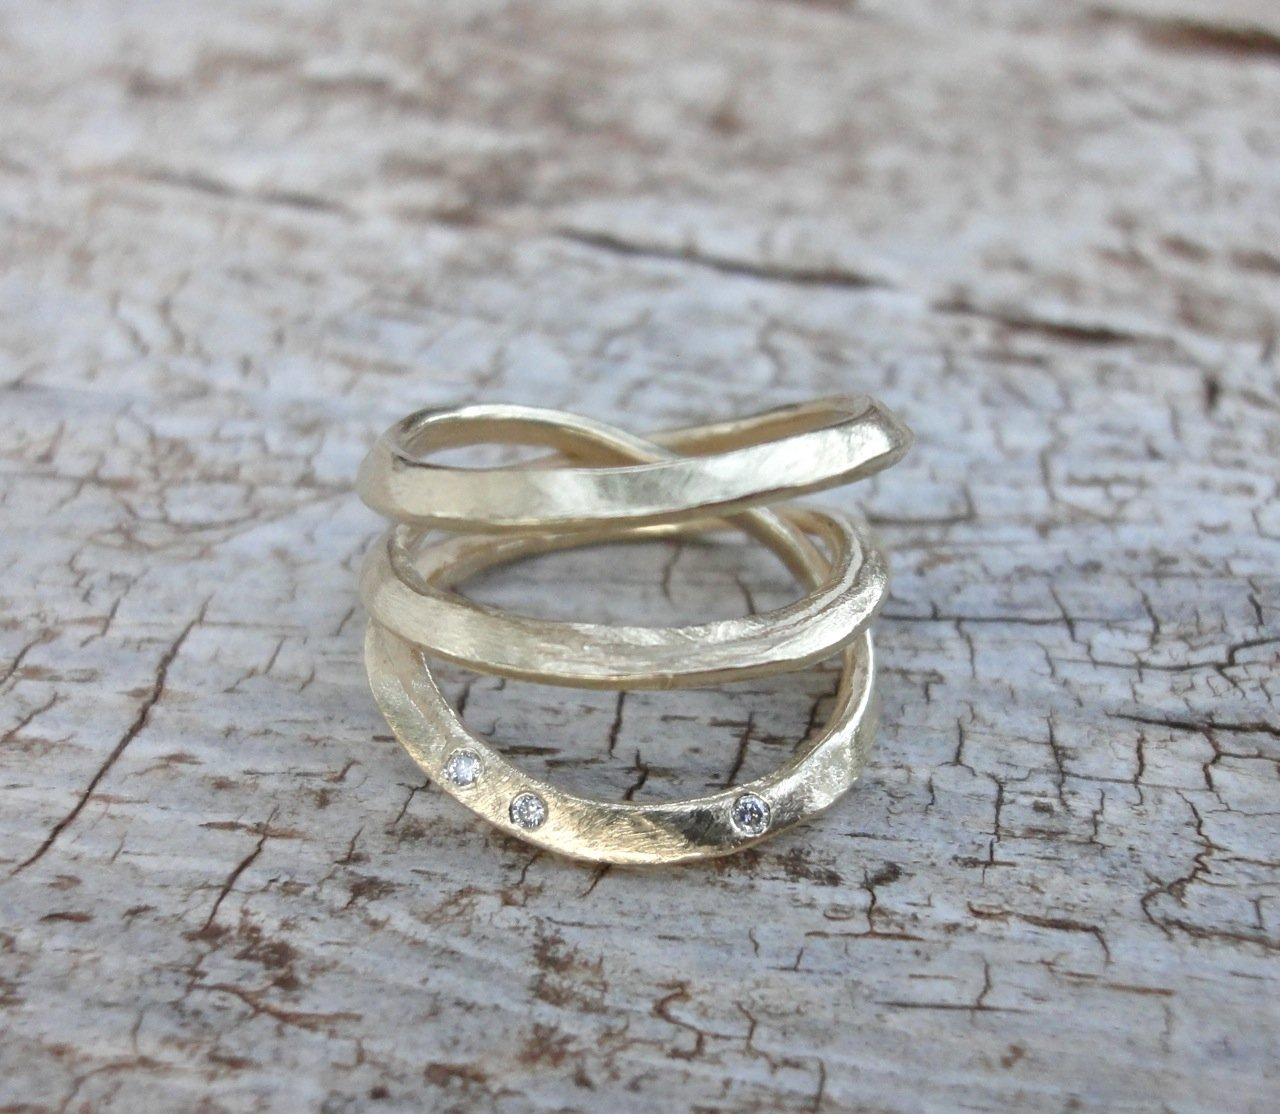 X-ring-with-diamonds-by-Tanja-Ting-.jpg